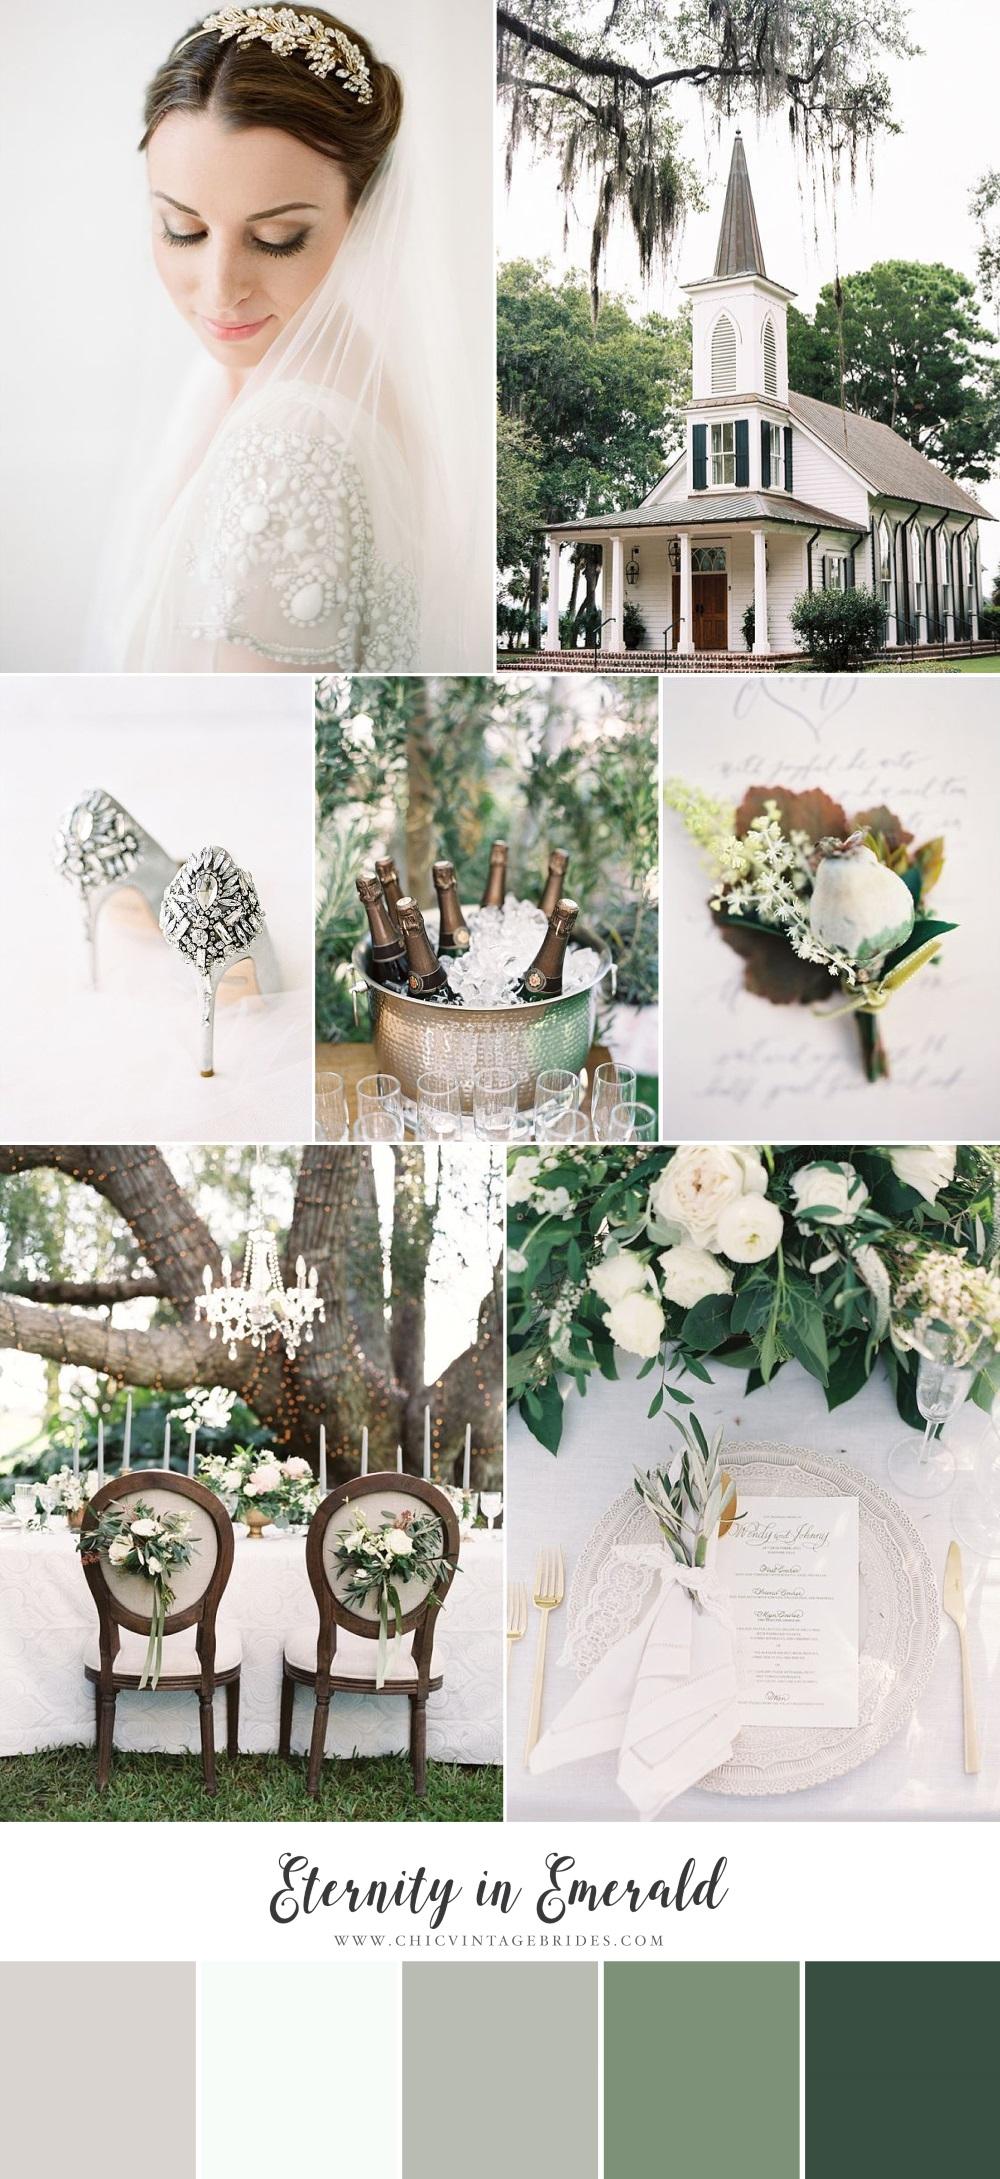 Eternity in Emerald - Timeless Wedding Inspiration Board